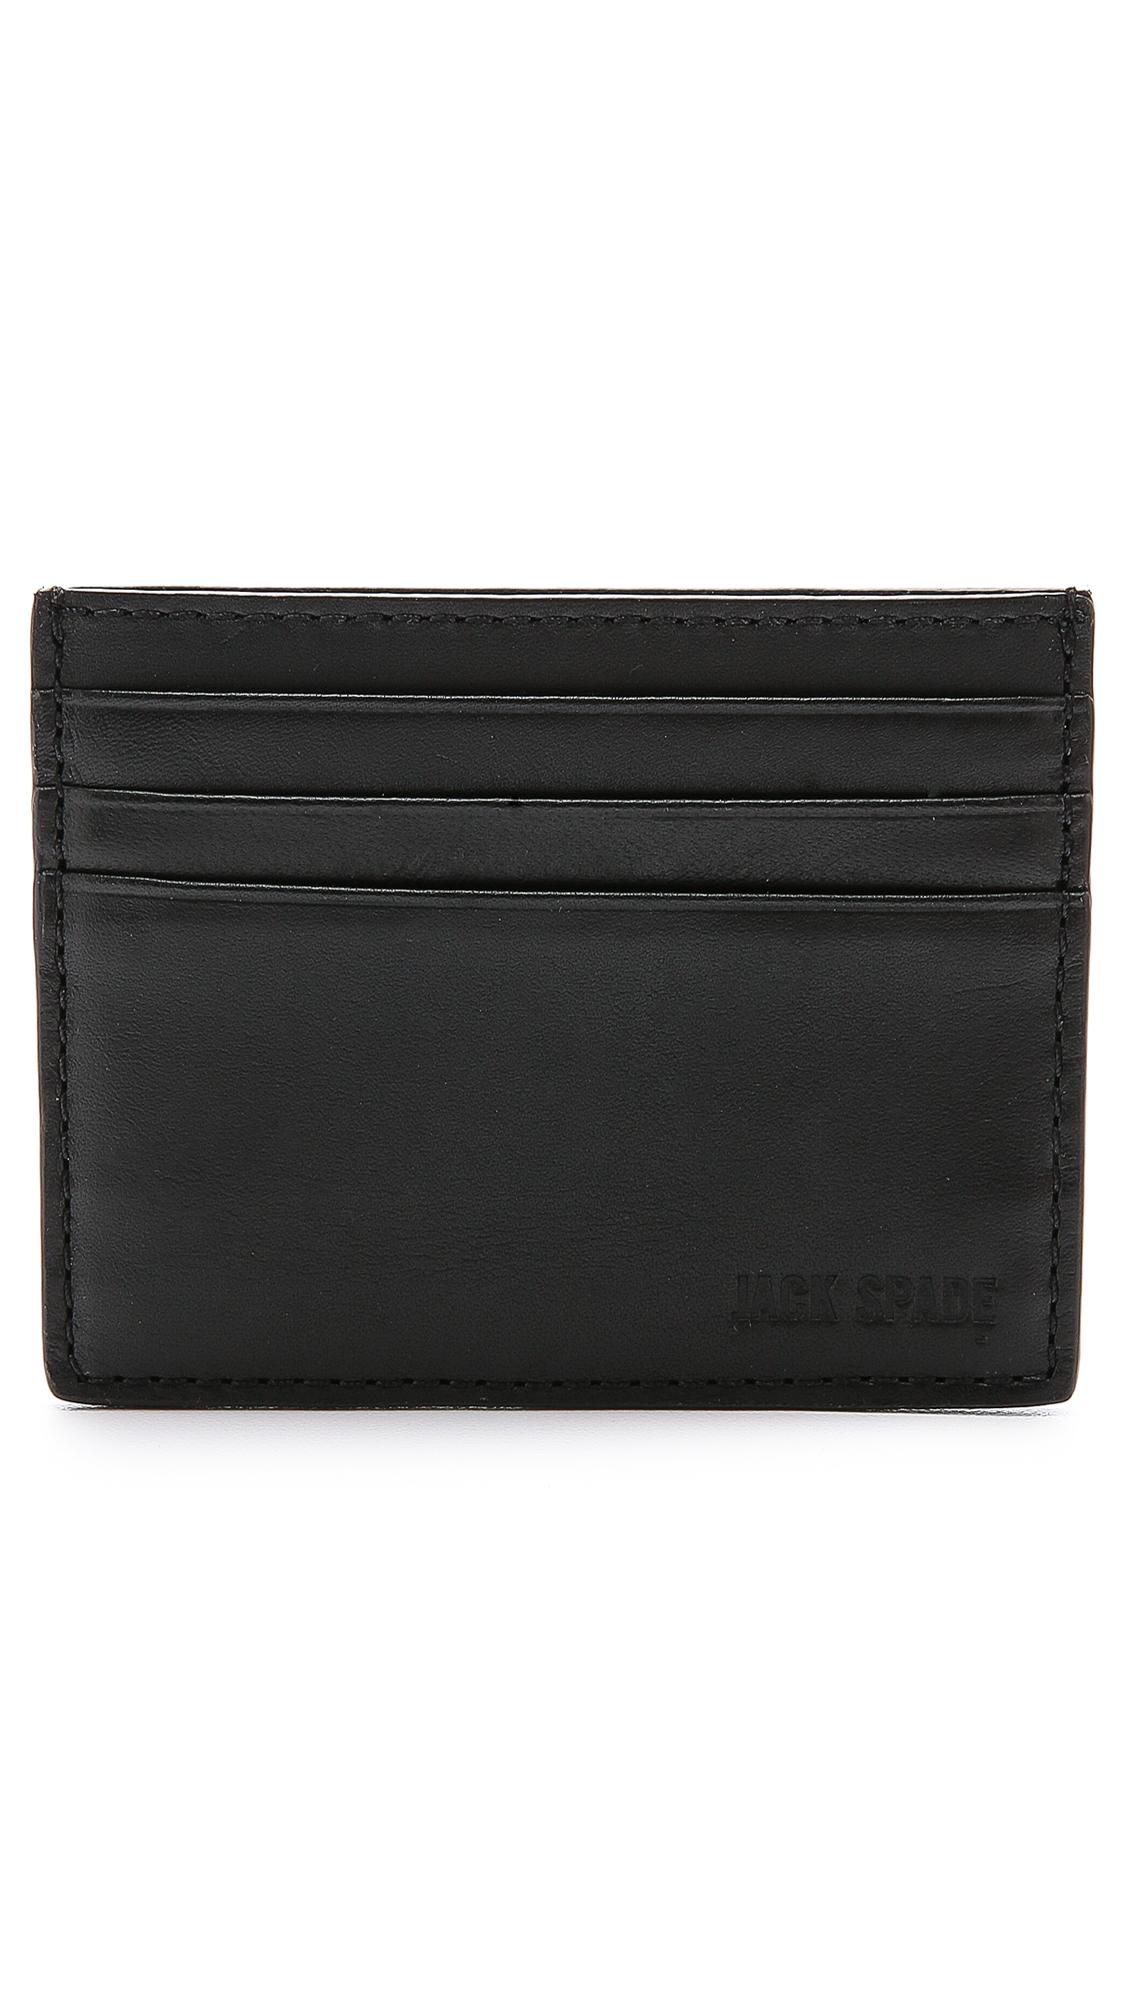 c322bb3b5d6f54 Jack Spade Grant Leather 6 Card Holder in Black for Men - Lyst